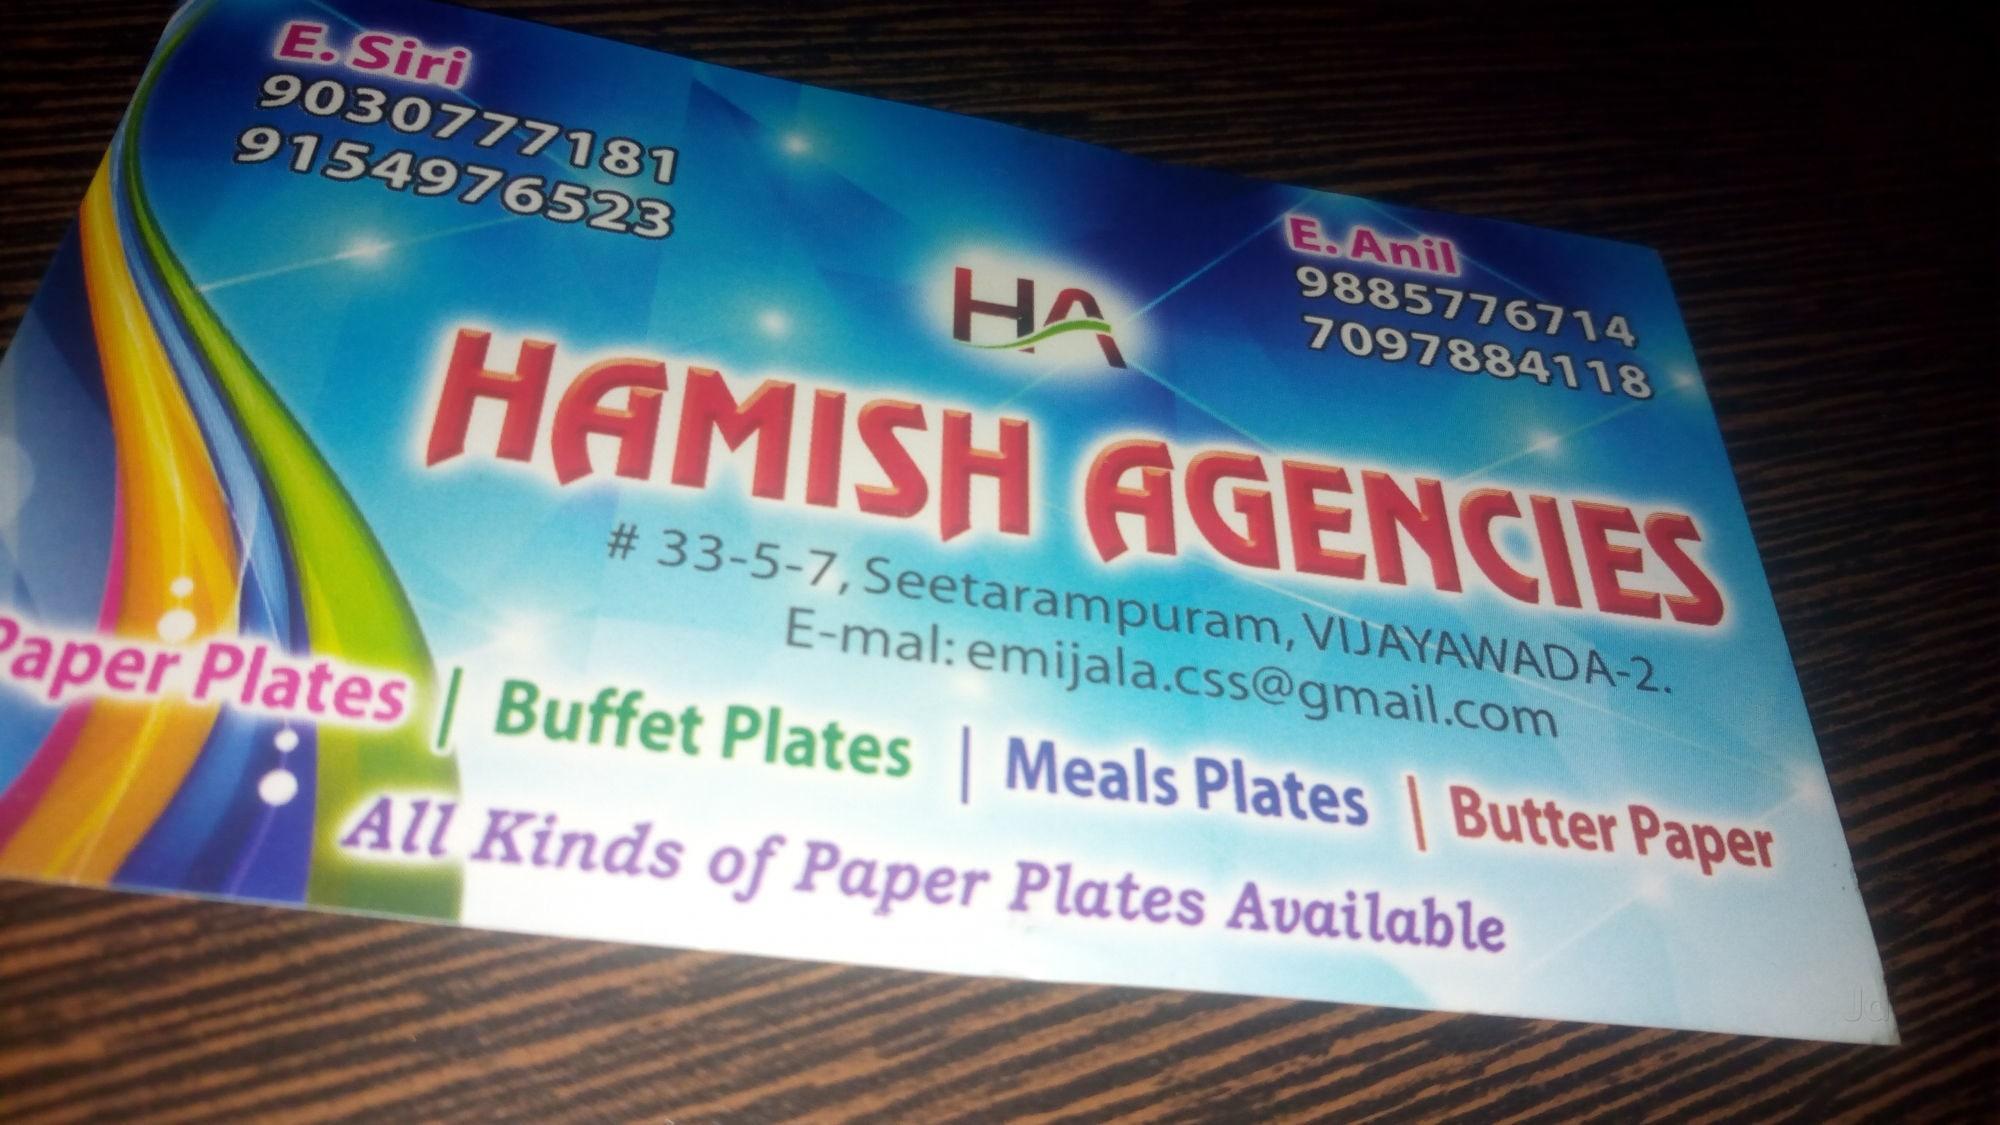 Paper Plate Manufacturers in Vijayawada & Top 100 Paper Plate Manufacturers in Vijayawada - Best Disposable ...